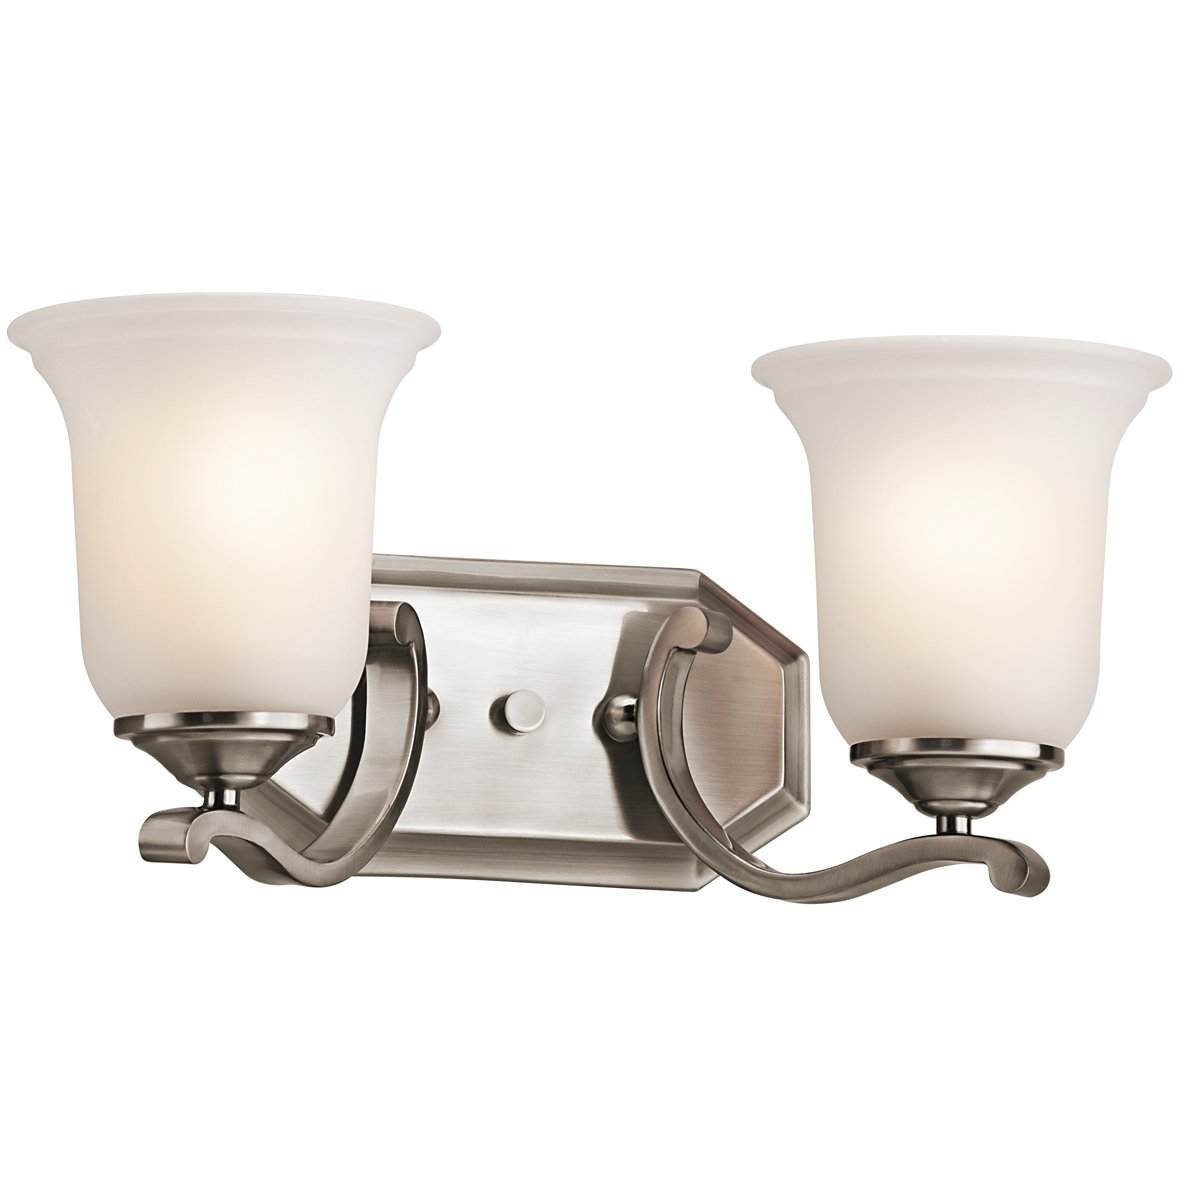 "Kichler 45402CLP Bath Vanity Wall Lighting Fixtures, Brushed Nickel 2-Light (16"" W x 8"" H) 200 Watts"